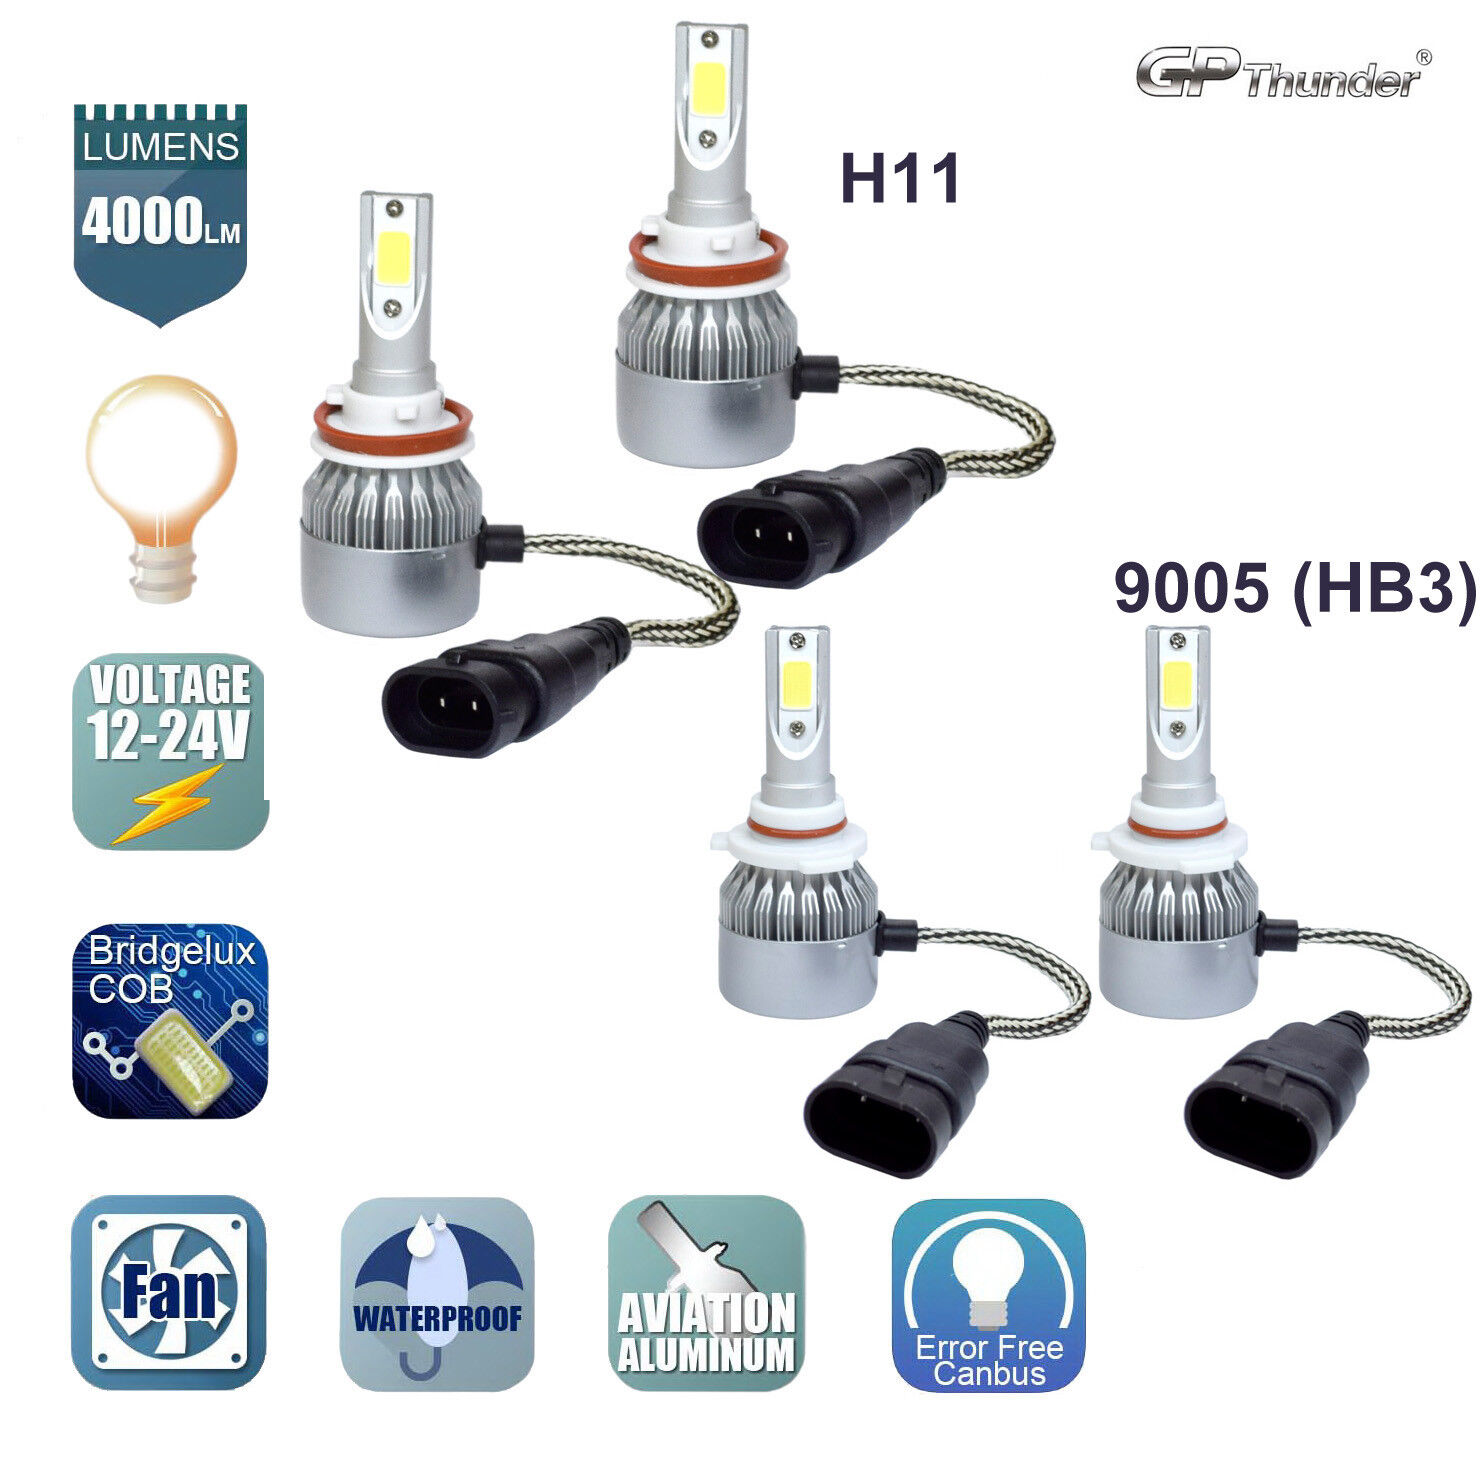 H11 Low Beam LED Headlight Bulb Kit For 2007-2017 Toyota Camry High Beam 9005